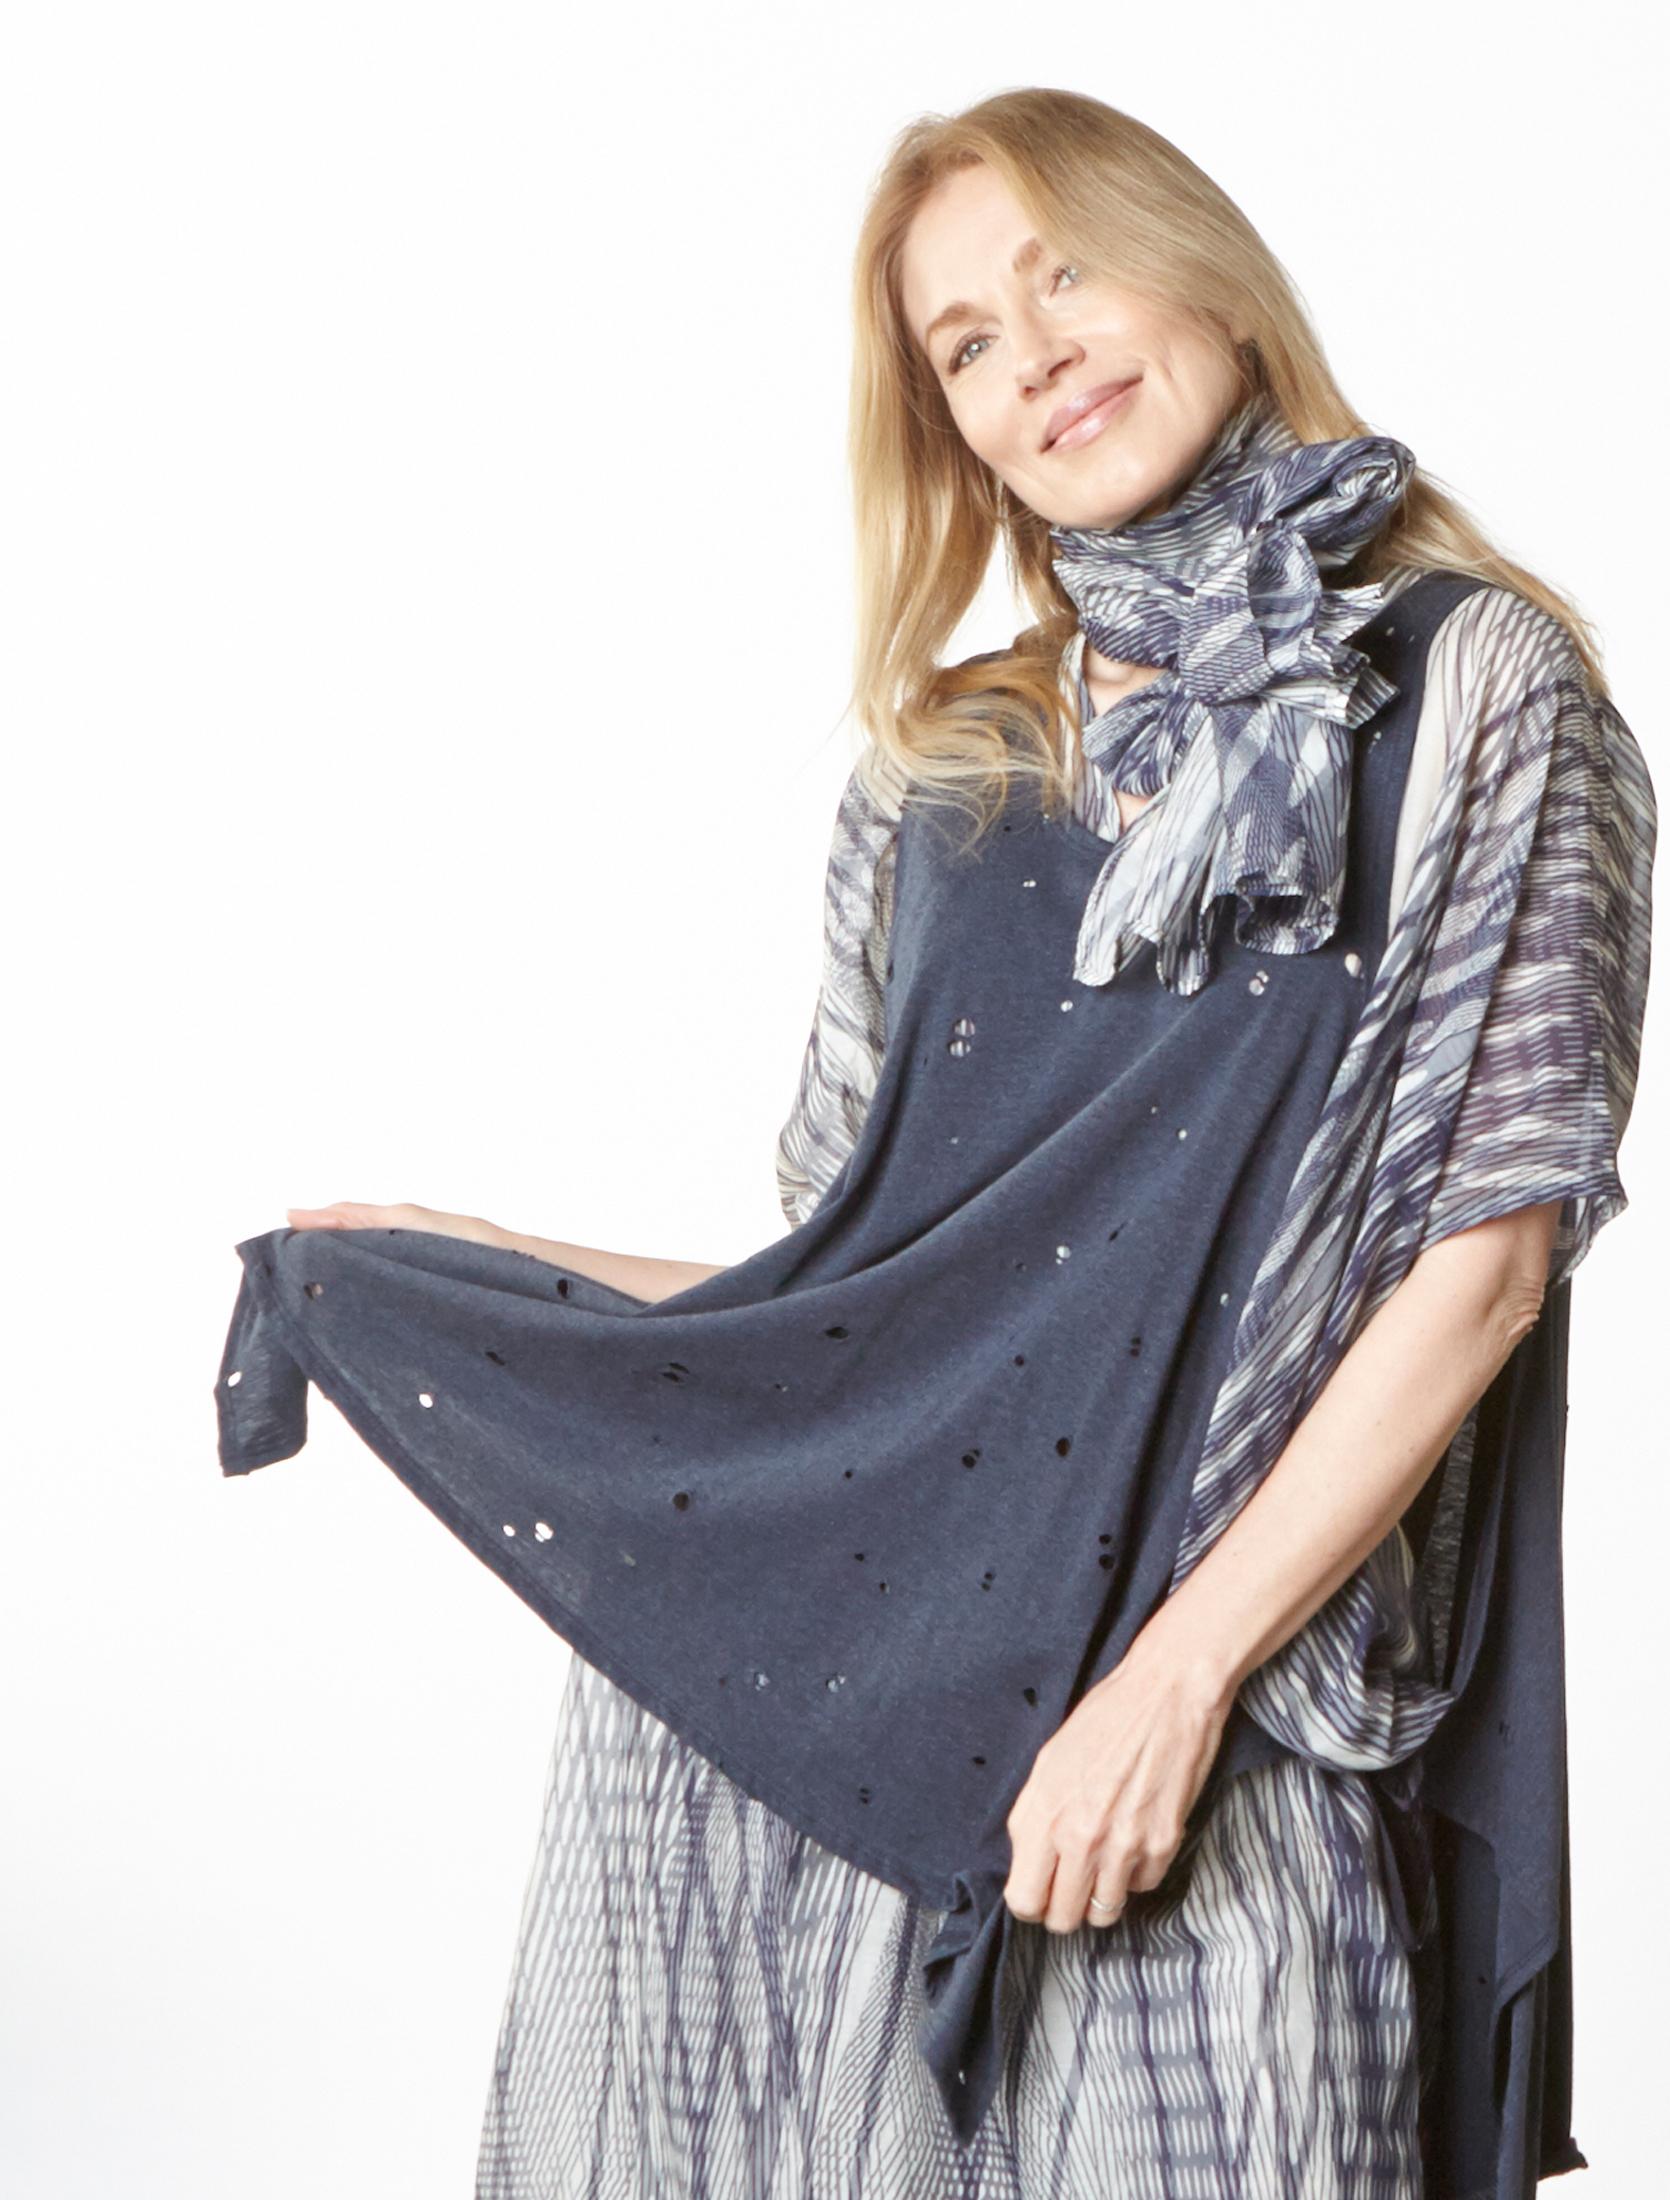 Zara Vest in Navy Italian Fori Jersey, Scarf, Petra Dress in Netto Italian Cotton/Silk